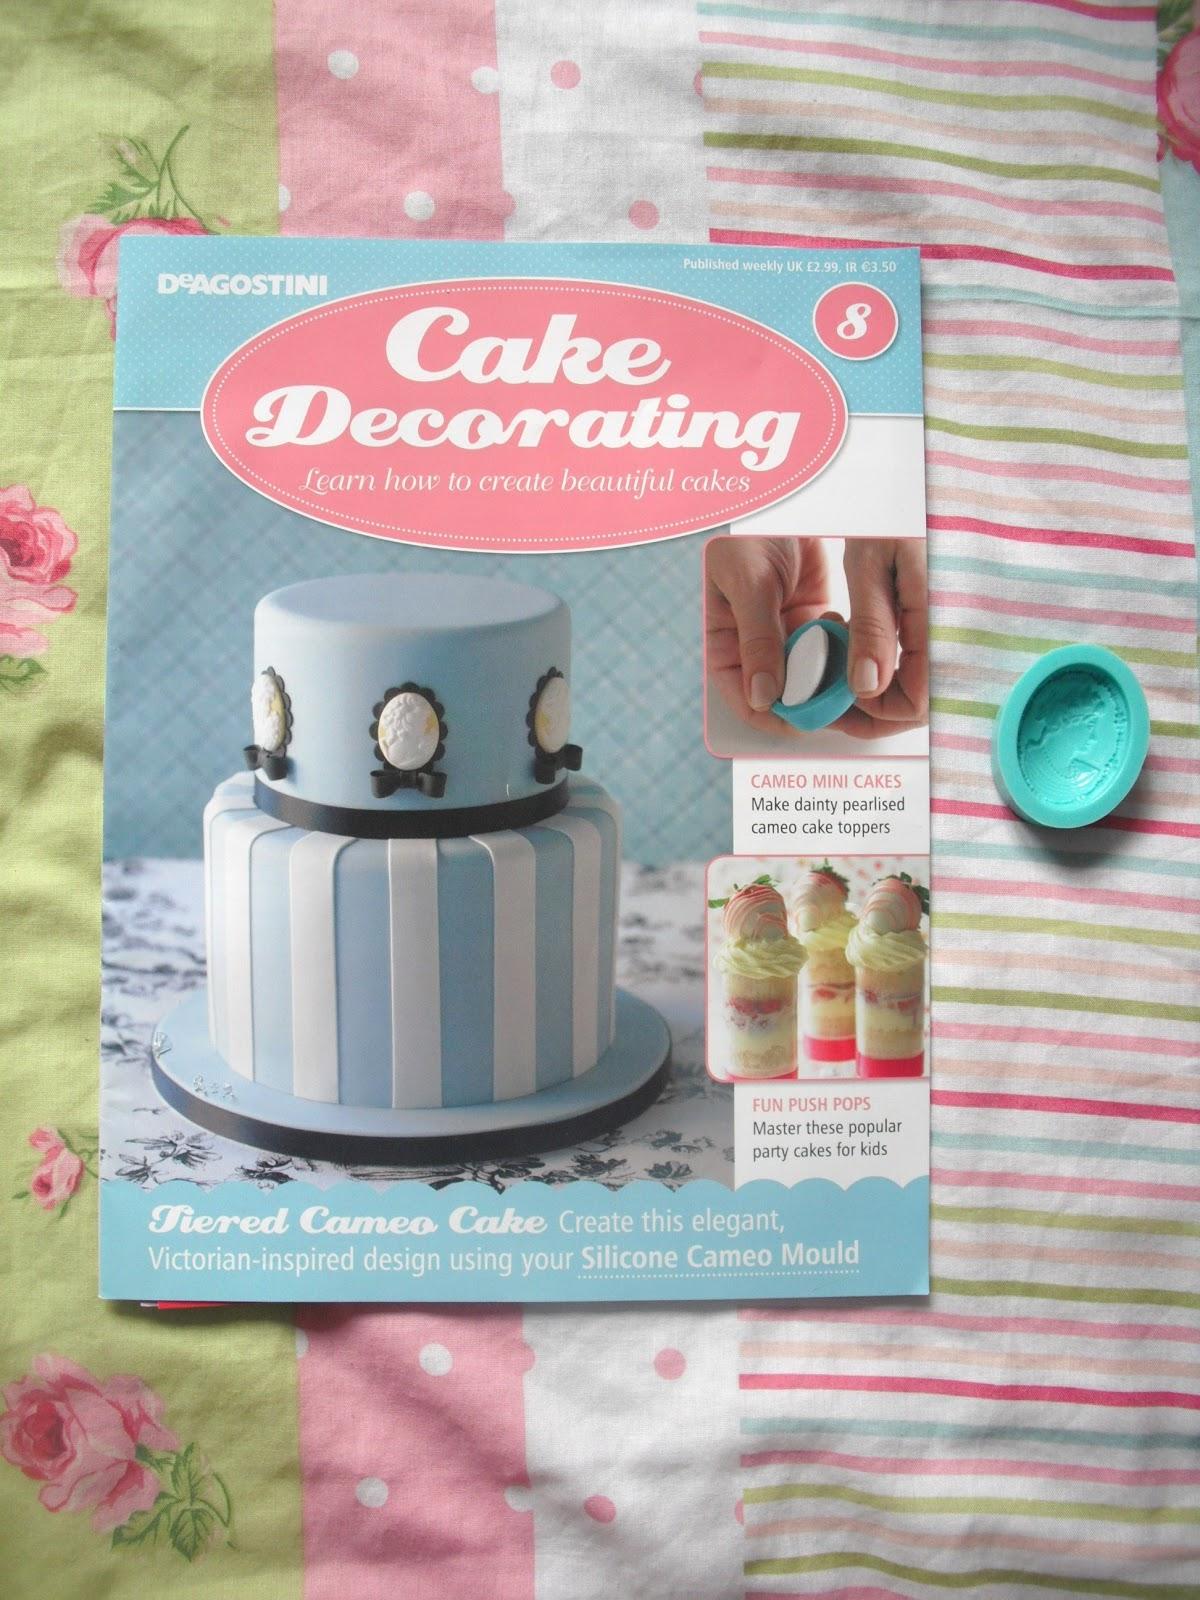 Cake Decorating Magazine Issue 8 - Free Cameo Mould ...